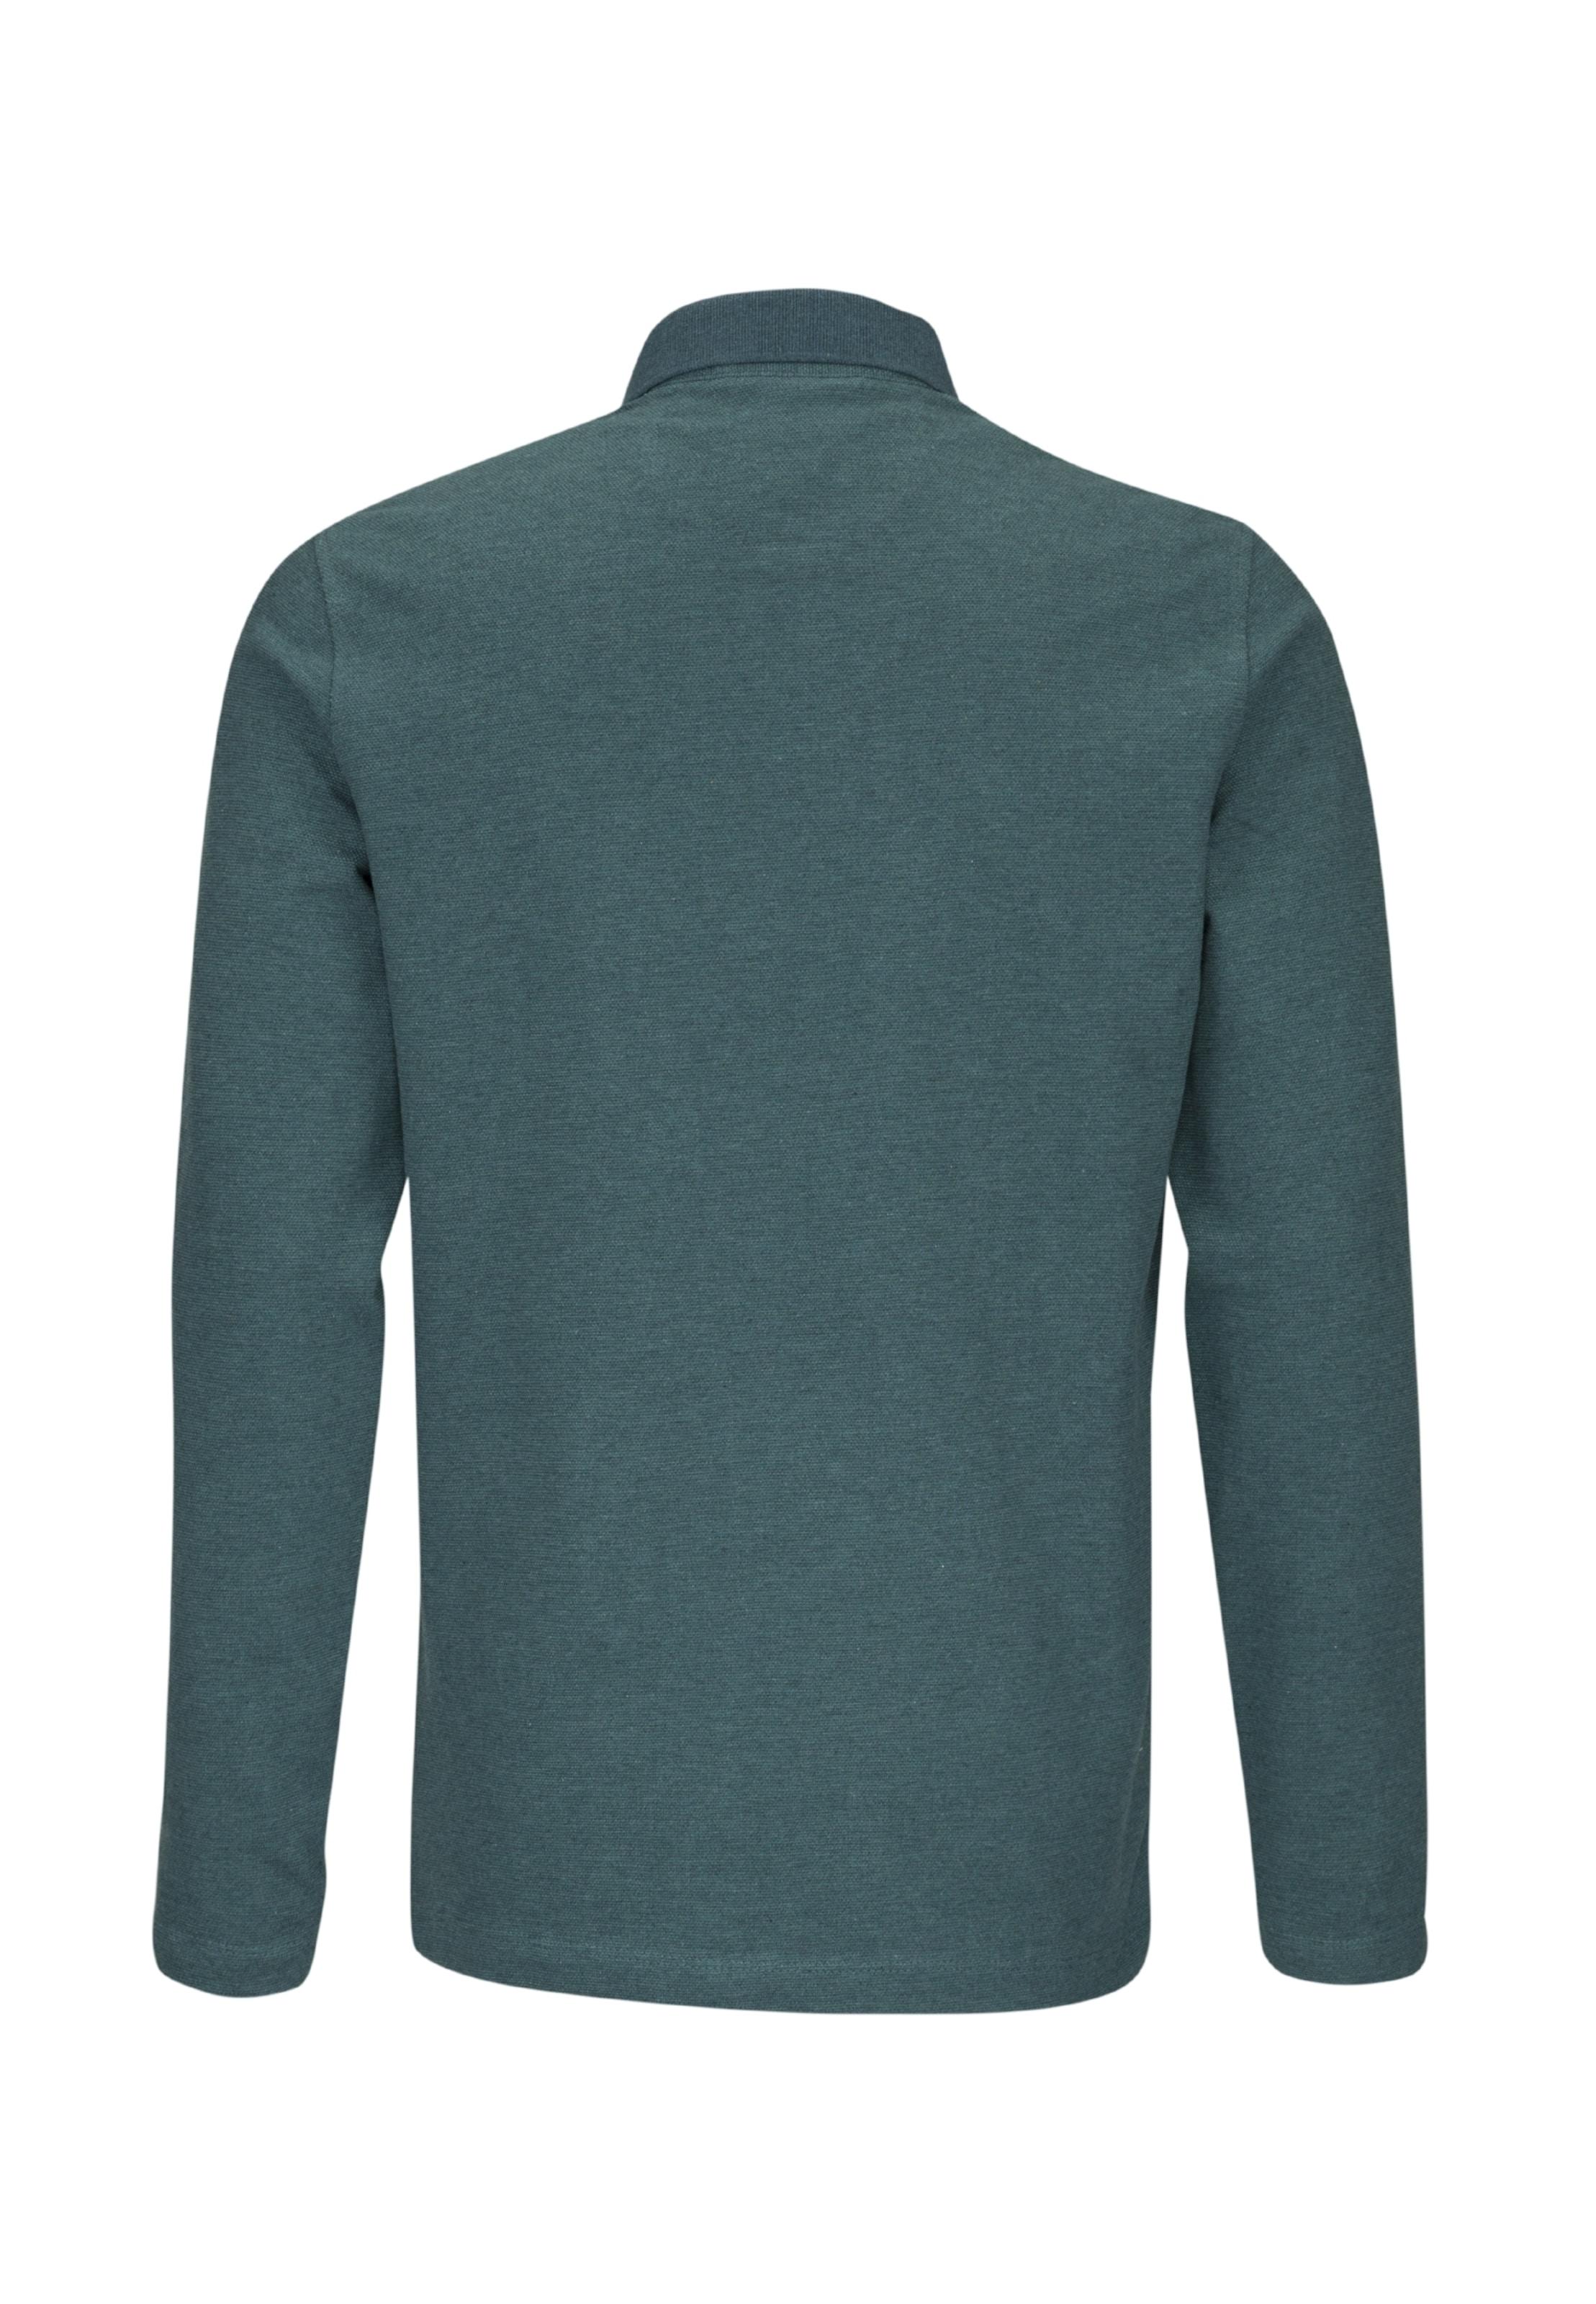 Bleu T Active Camel En shirt gris yf6gv7Yb